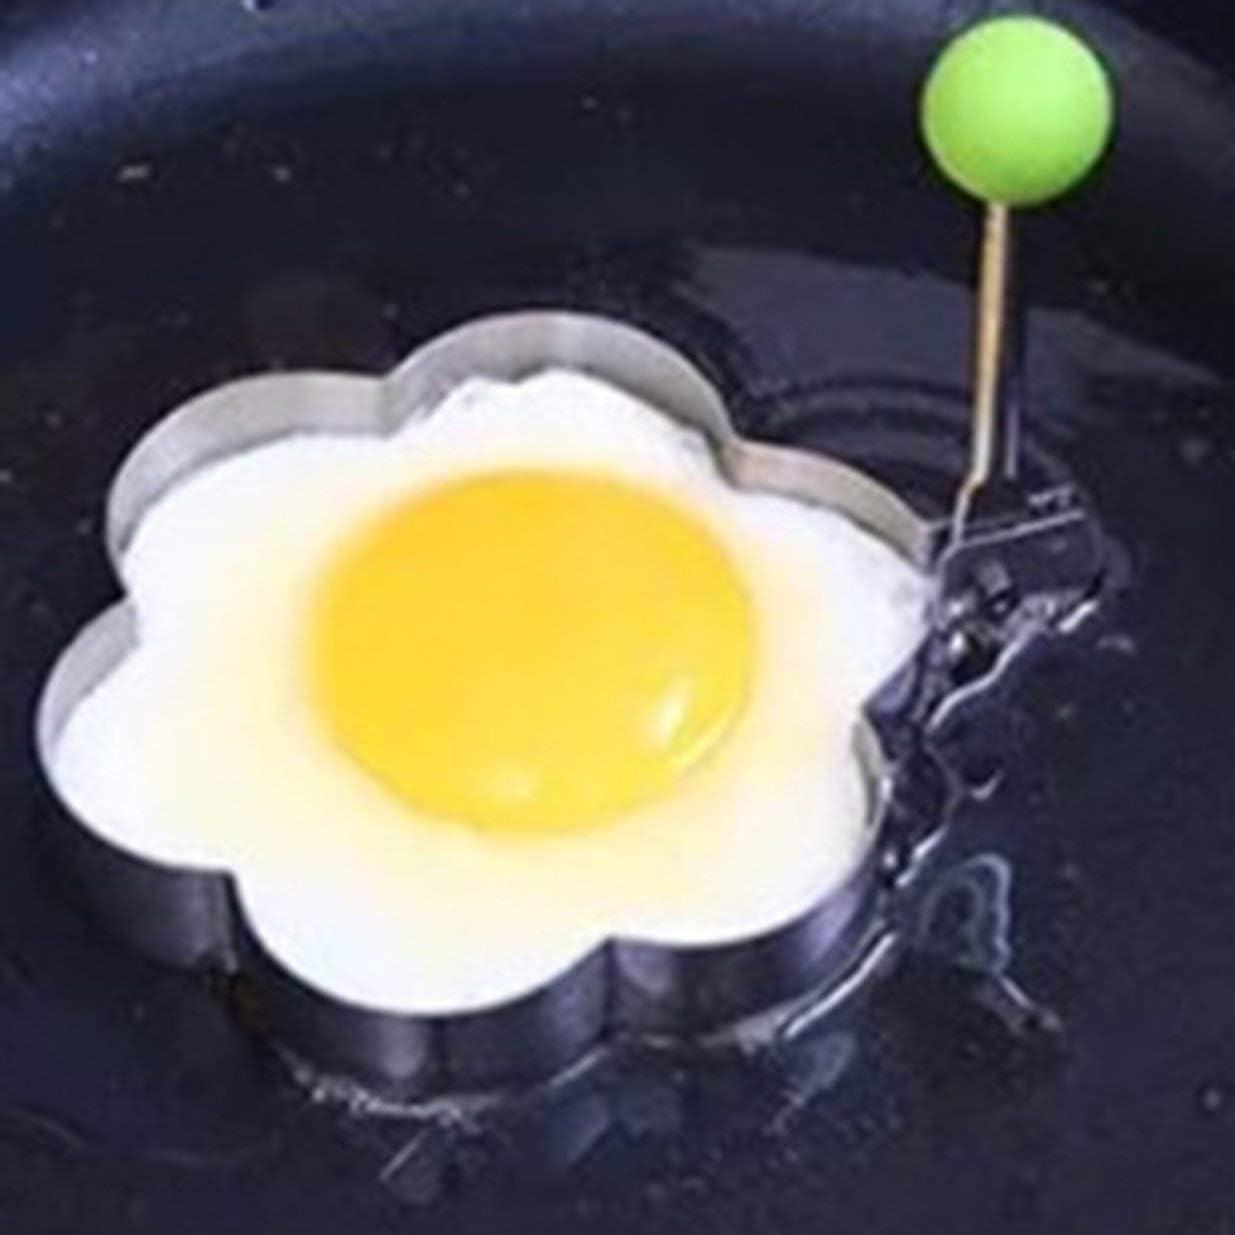 Plum Blossom Stainless Steel Form for Frying Eggs Tools Breakfast Omelette Mold Device Pancake Ring Egg Shaped Kitchen Tool Plum Blossom